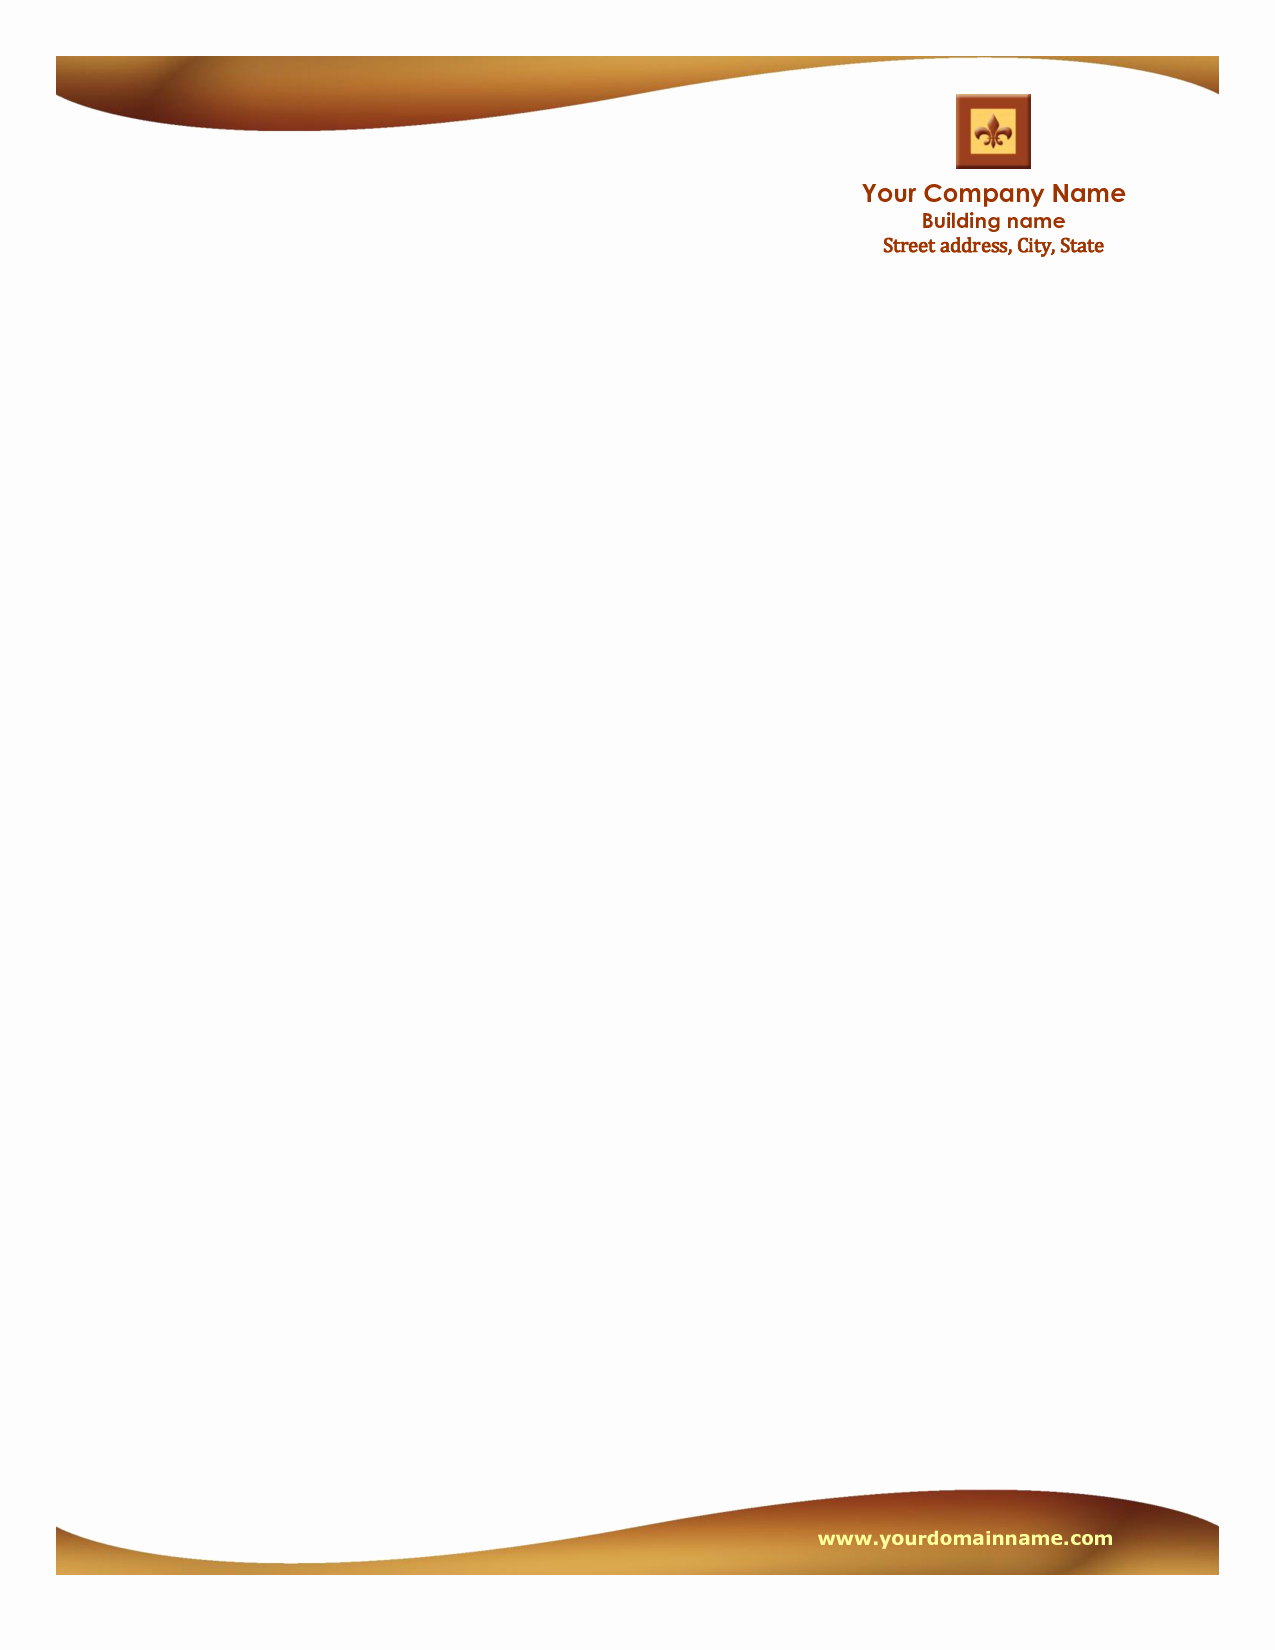 Company Letterhead Template Word Luxury Letterhead Templates Free